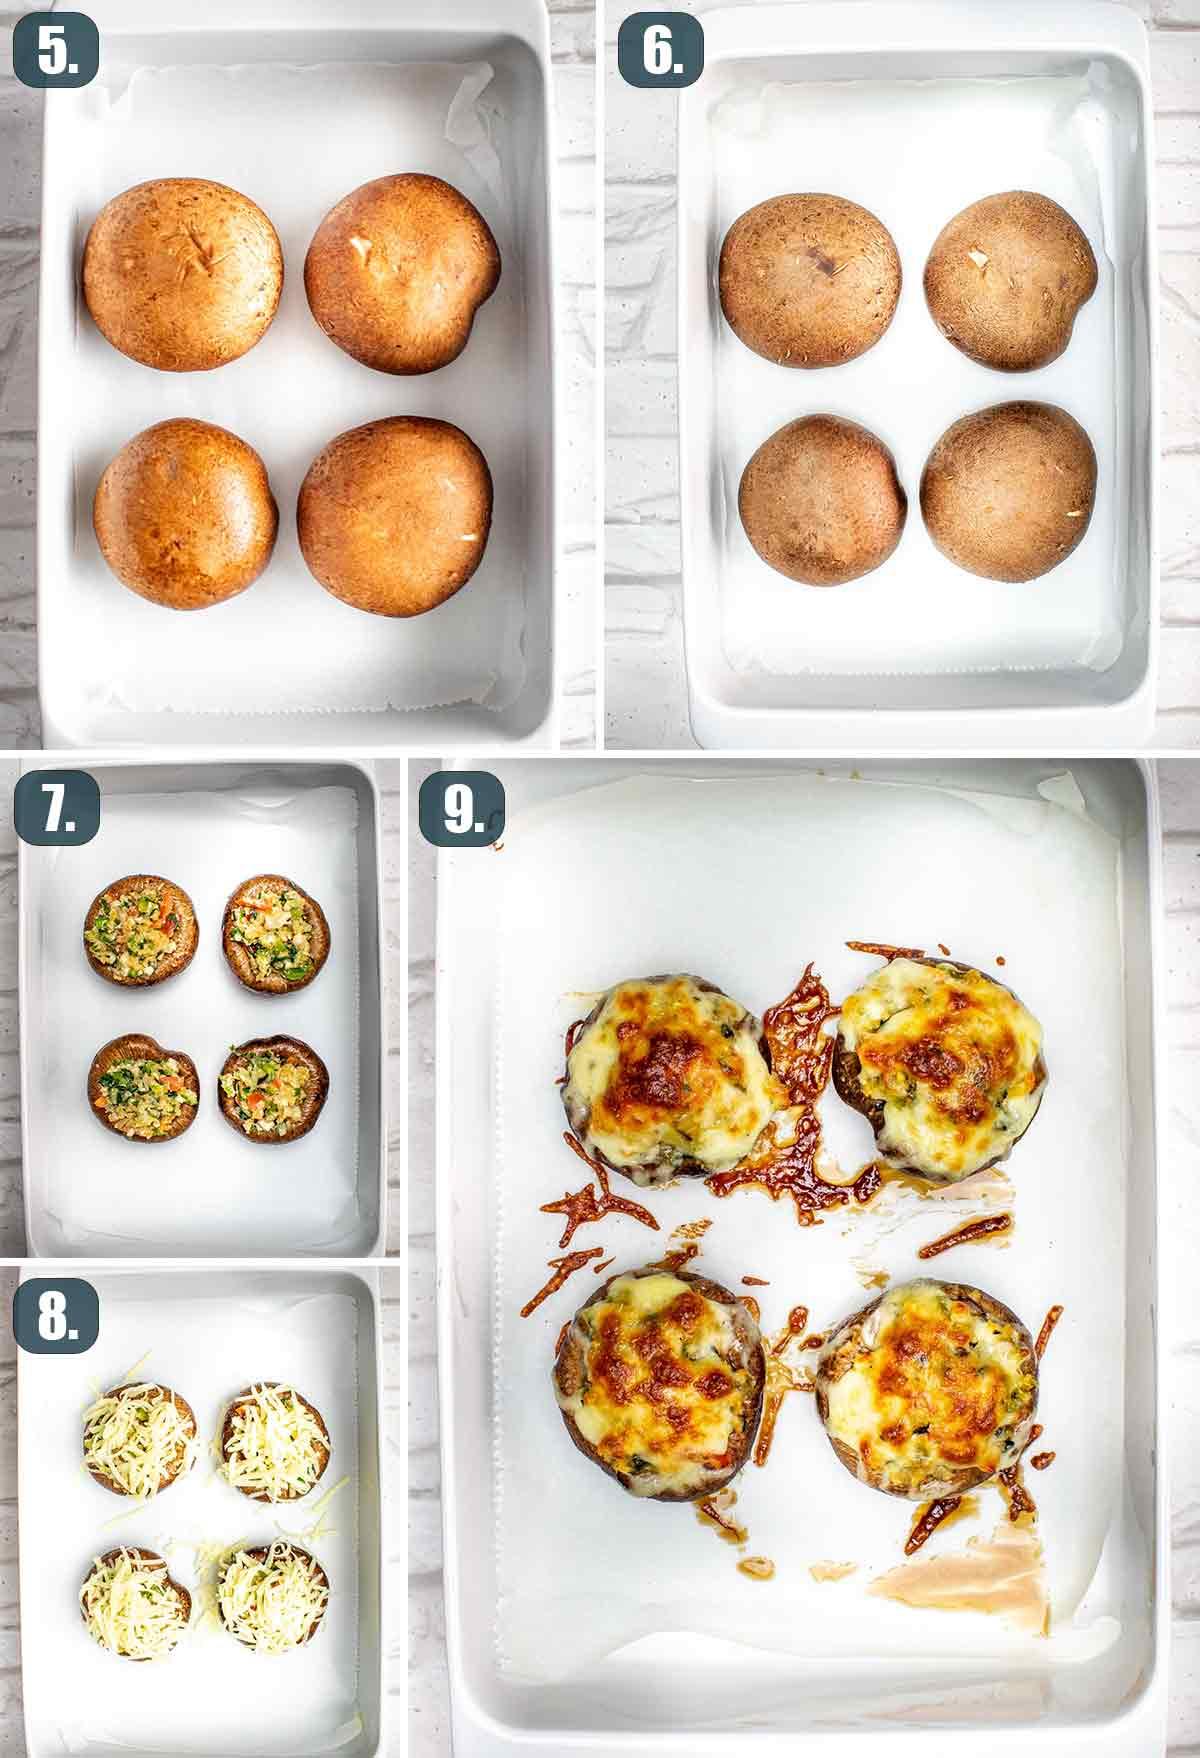 process shots showing how to assemble and stuff portobello mushrooms.